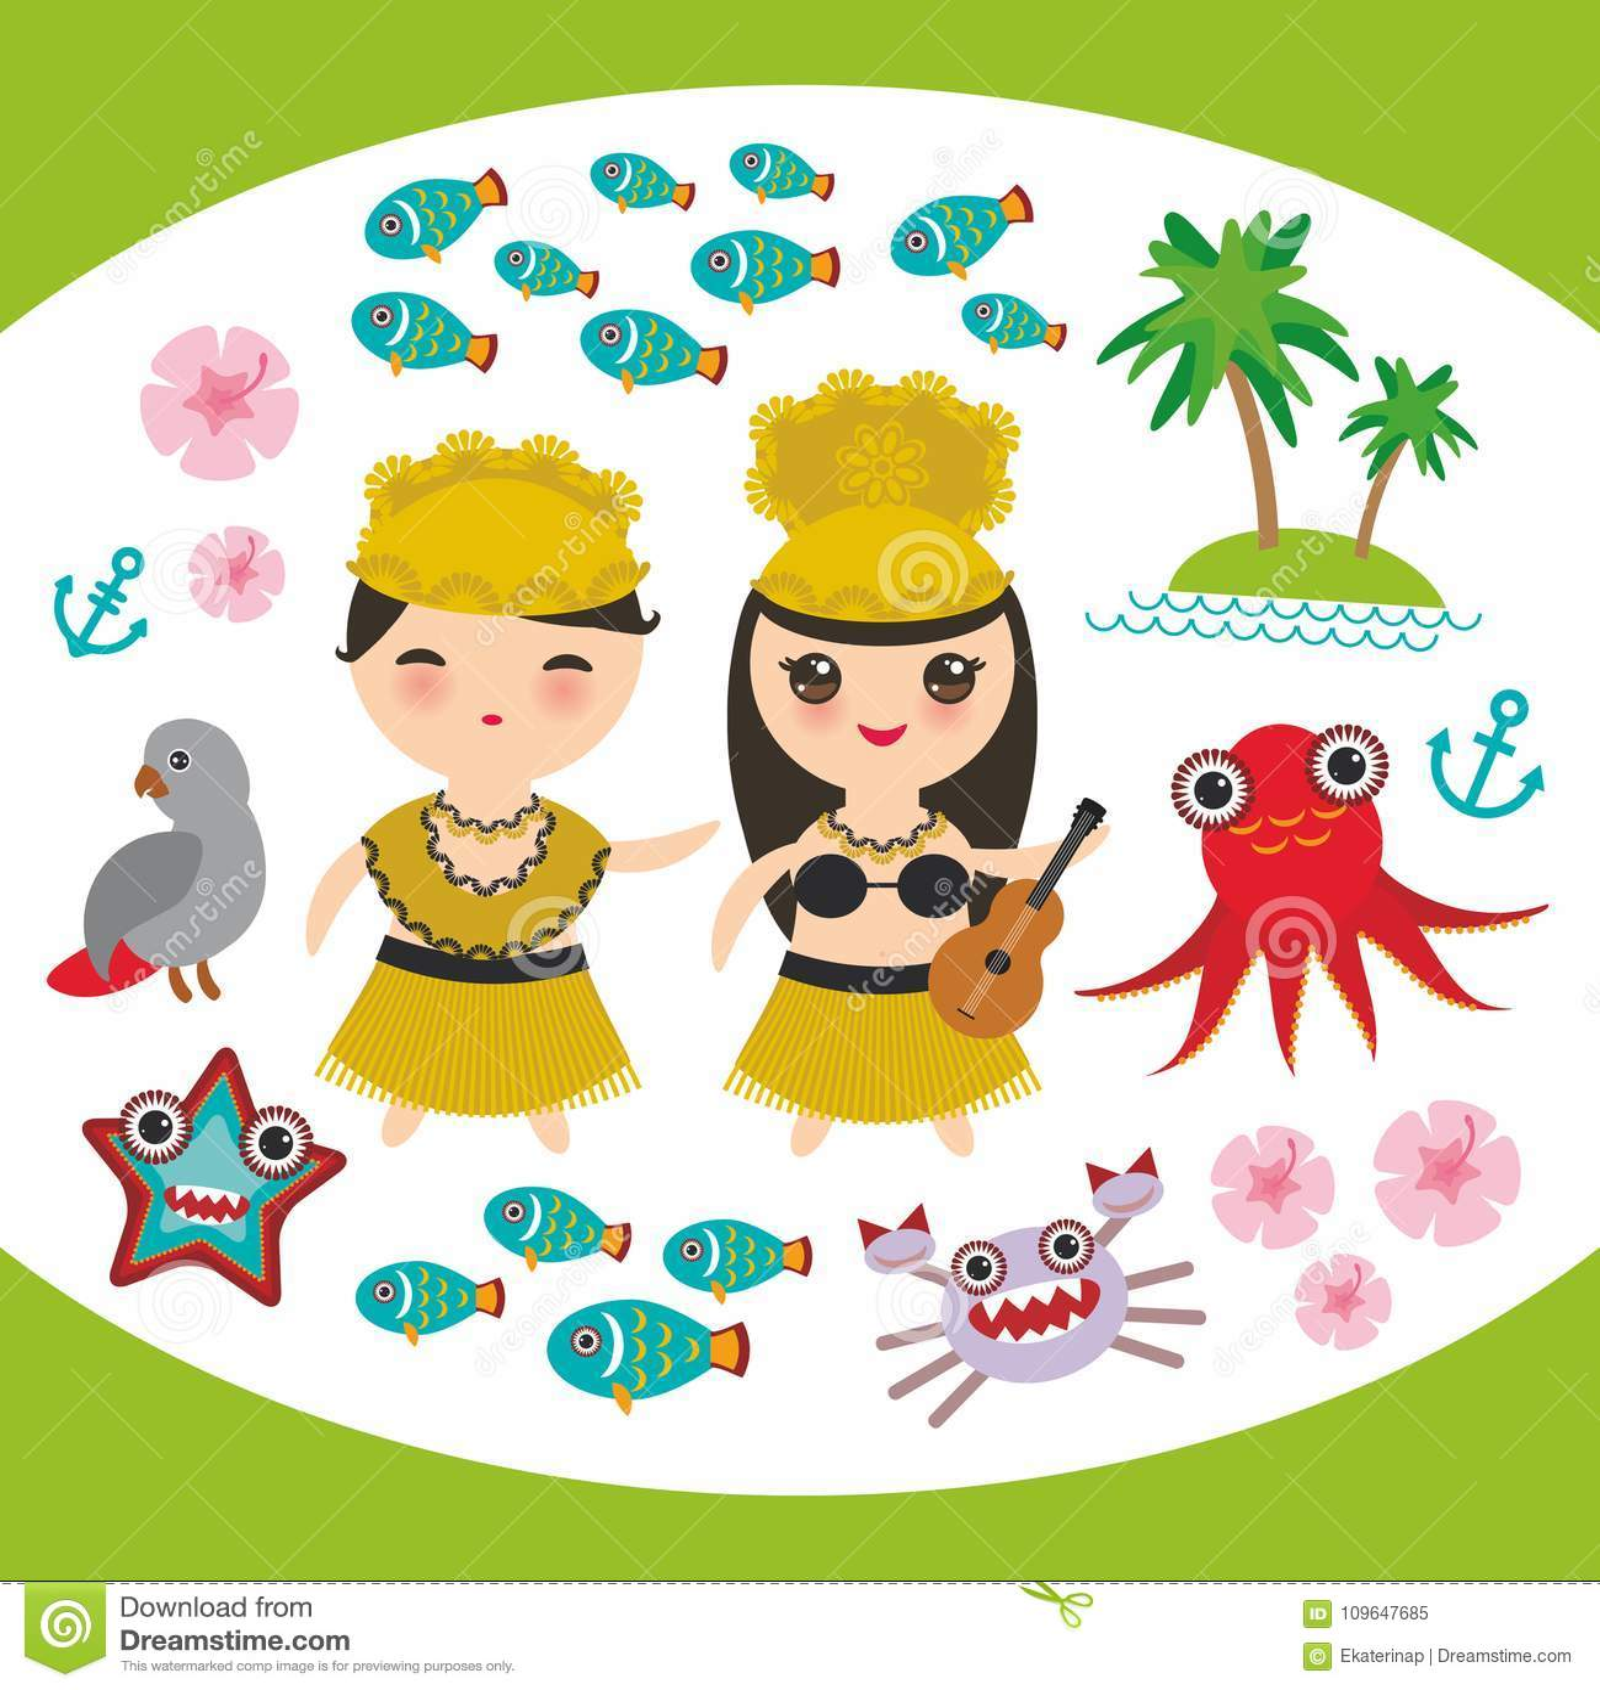 Card design hawaiian hula dancer kawaii boy girl set hawaii icons card design hawaiian hula dancer kawaii boy girl set hawaii icons symbols guitar ukulele flowers parrot fish crab octopus anchor f izmirmasajfo Gallery